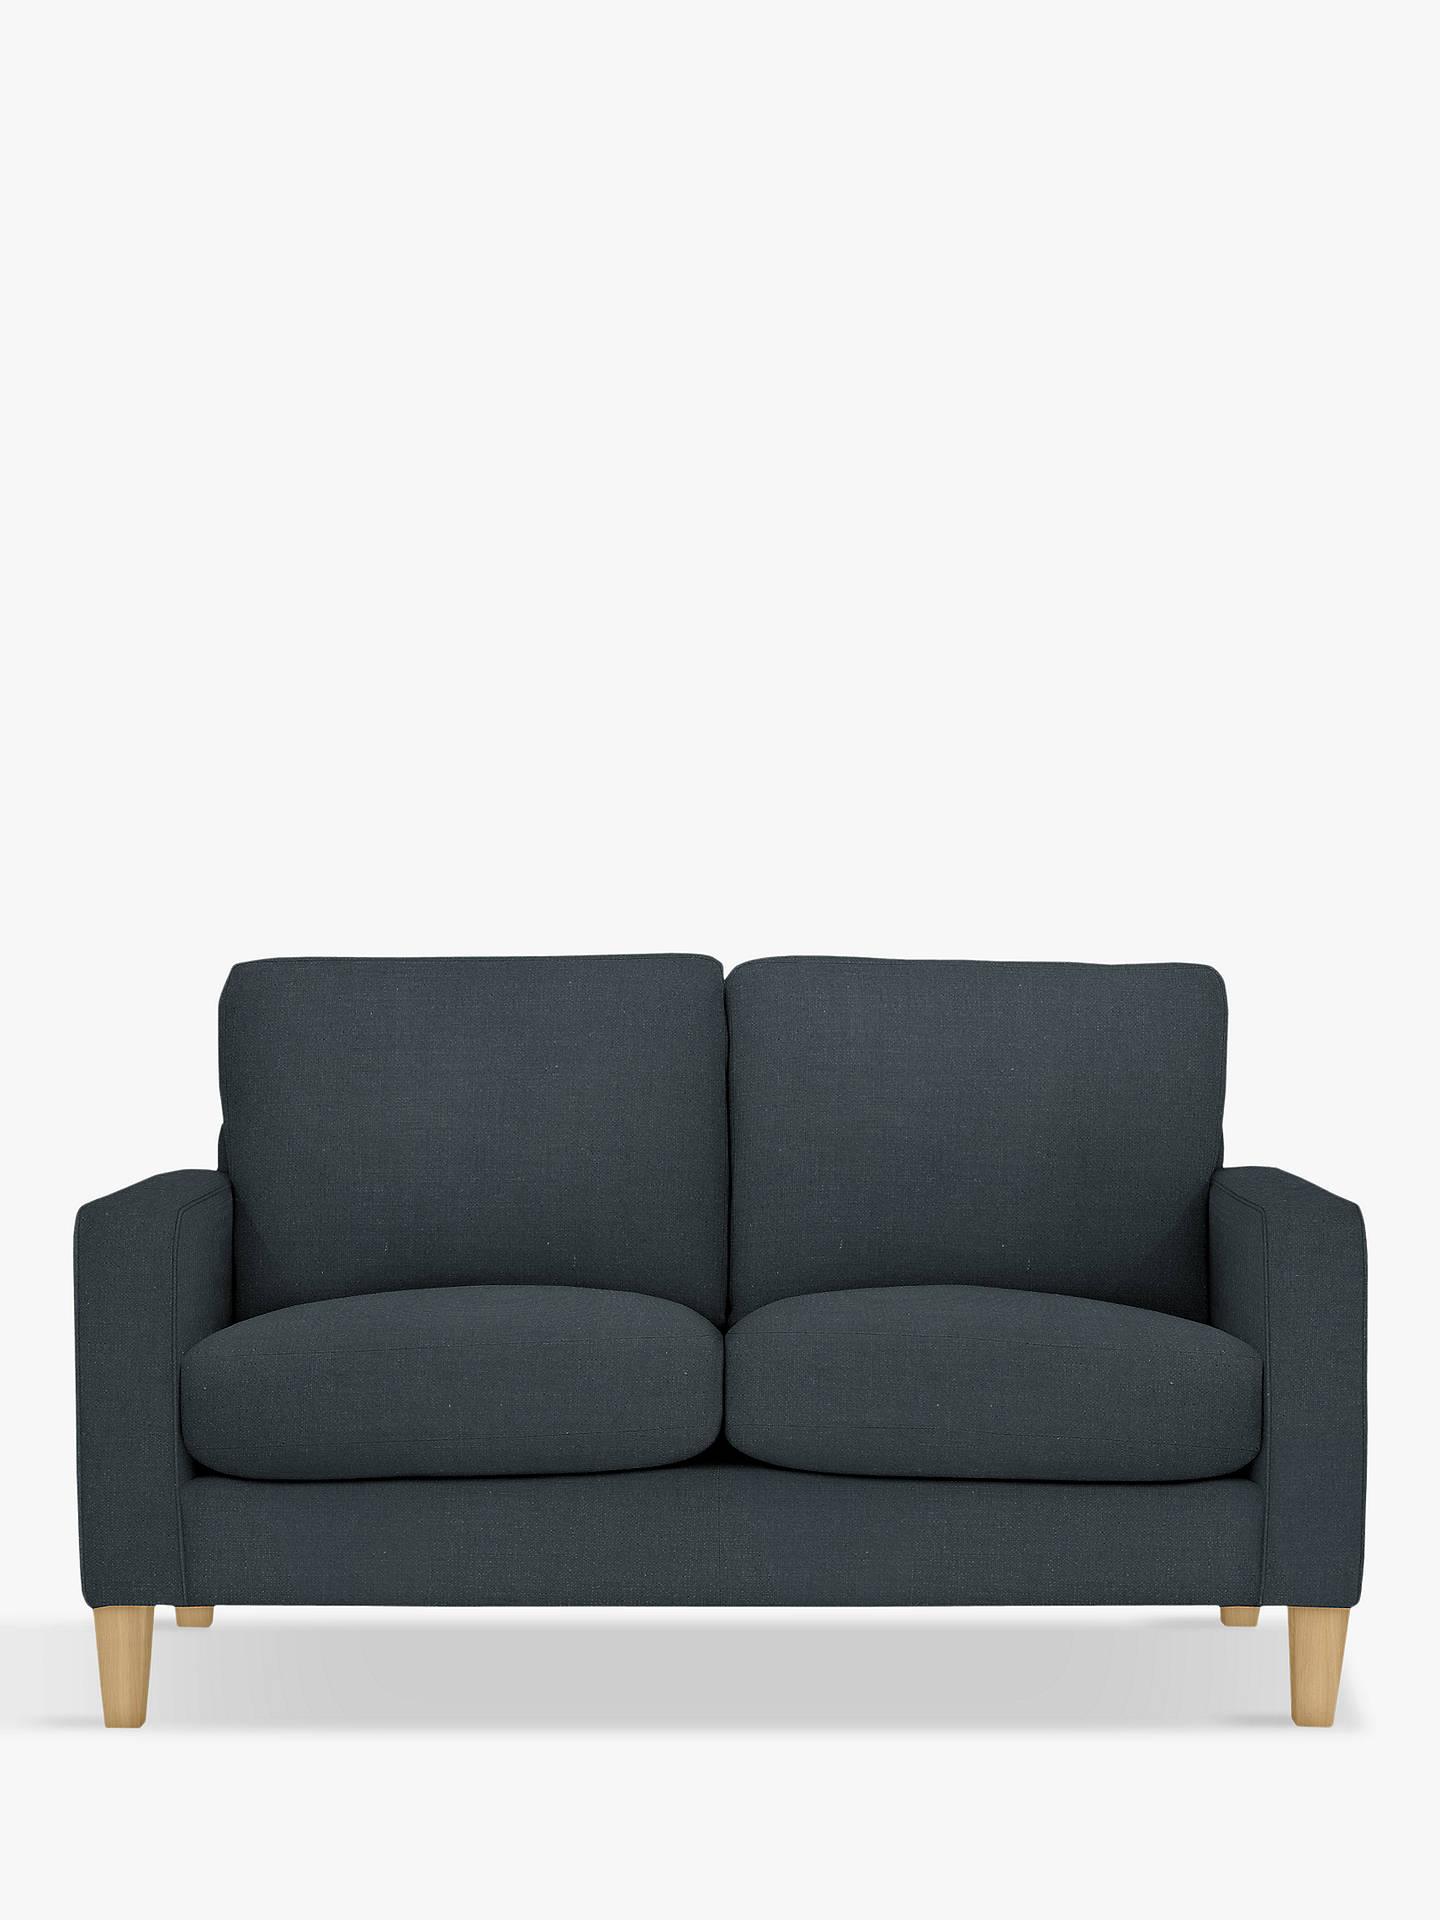 Tremendous John Lewis Partners The Basics Jackson Small 2 Seater Sofa Grey Ibusinesslaw Wood Chair Design Ideas Ibusinesslaworg